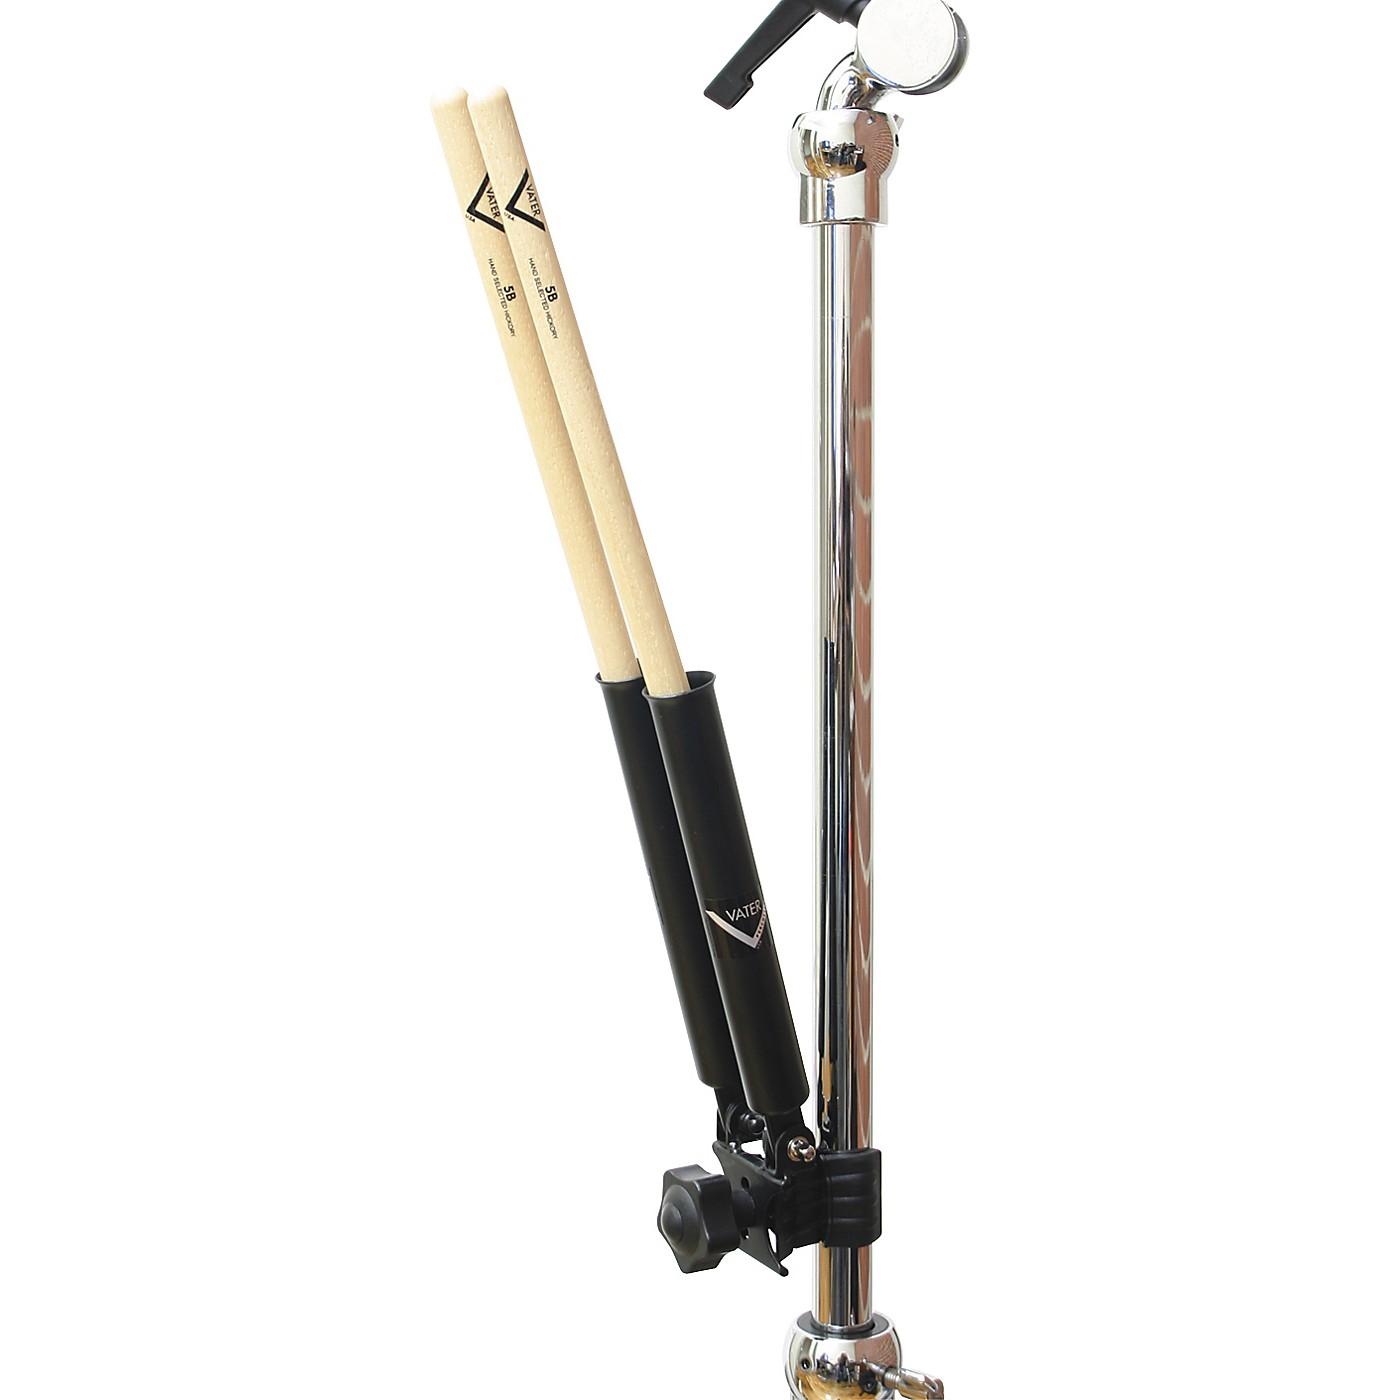 Vater Single-Pair Drum Stick Holder thumbnail